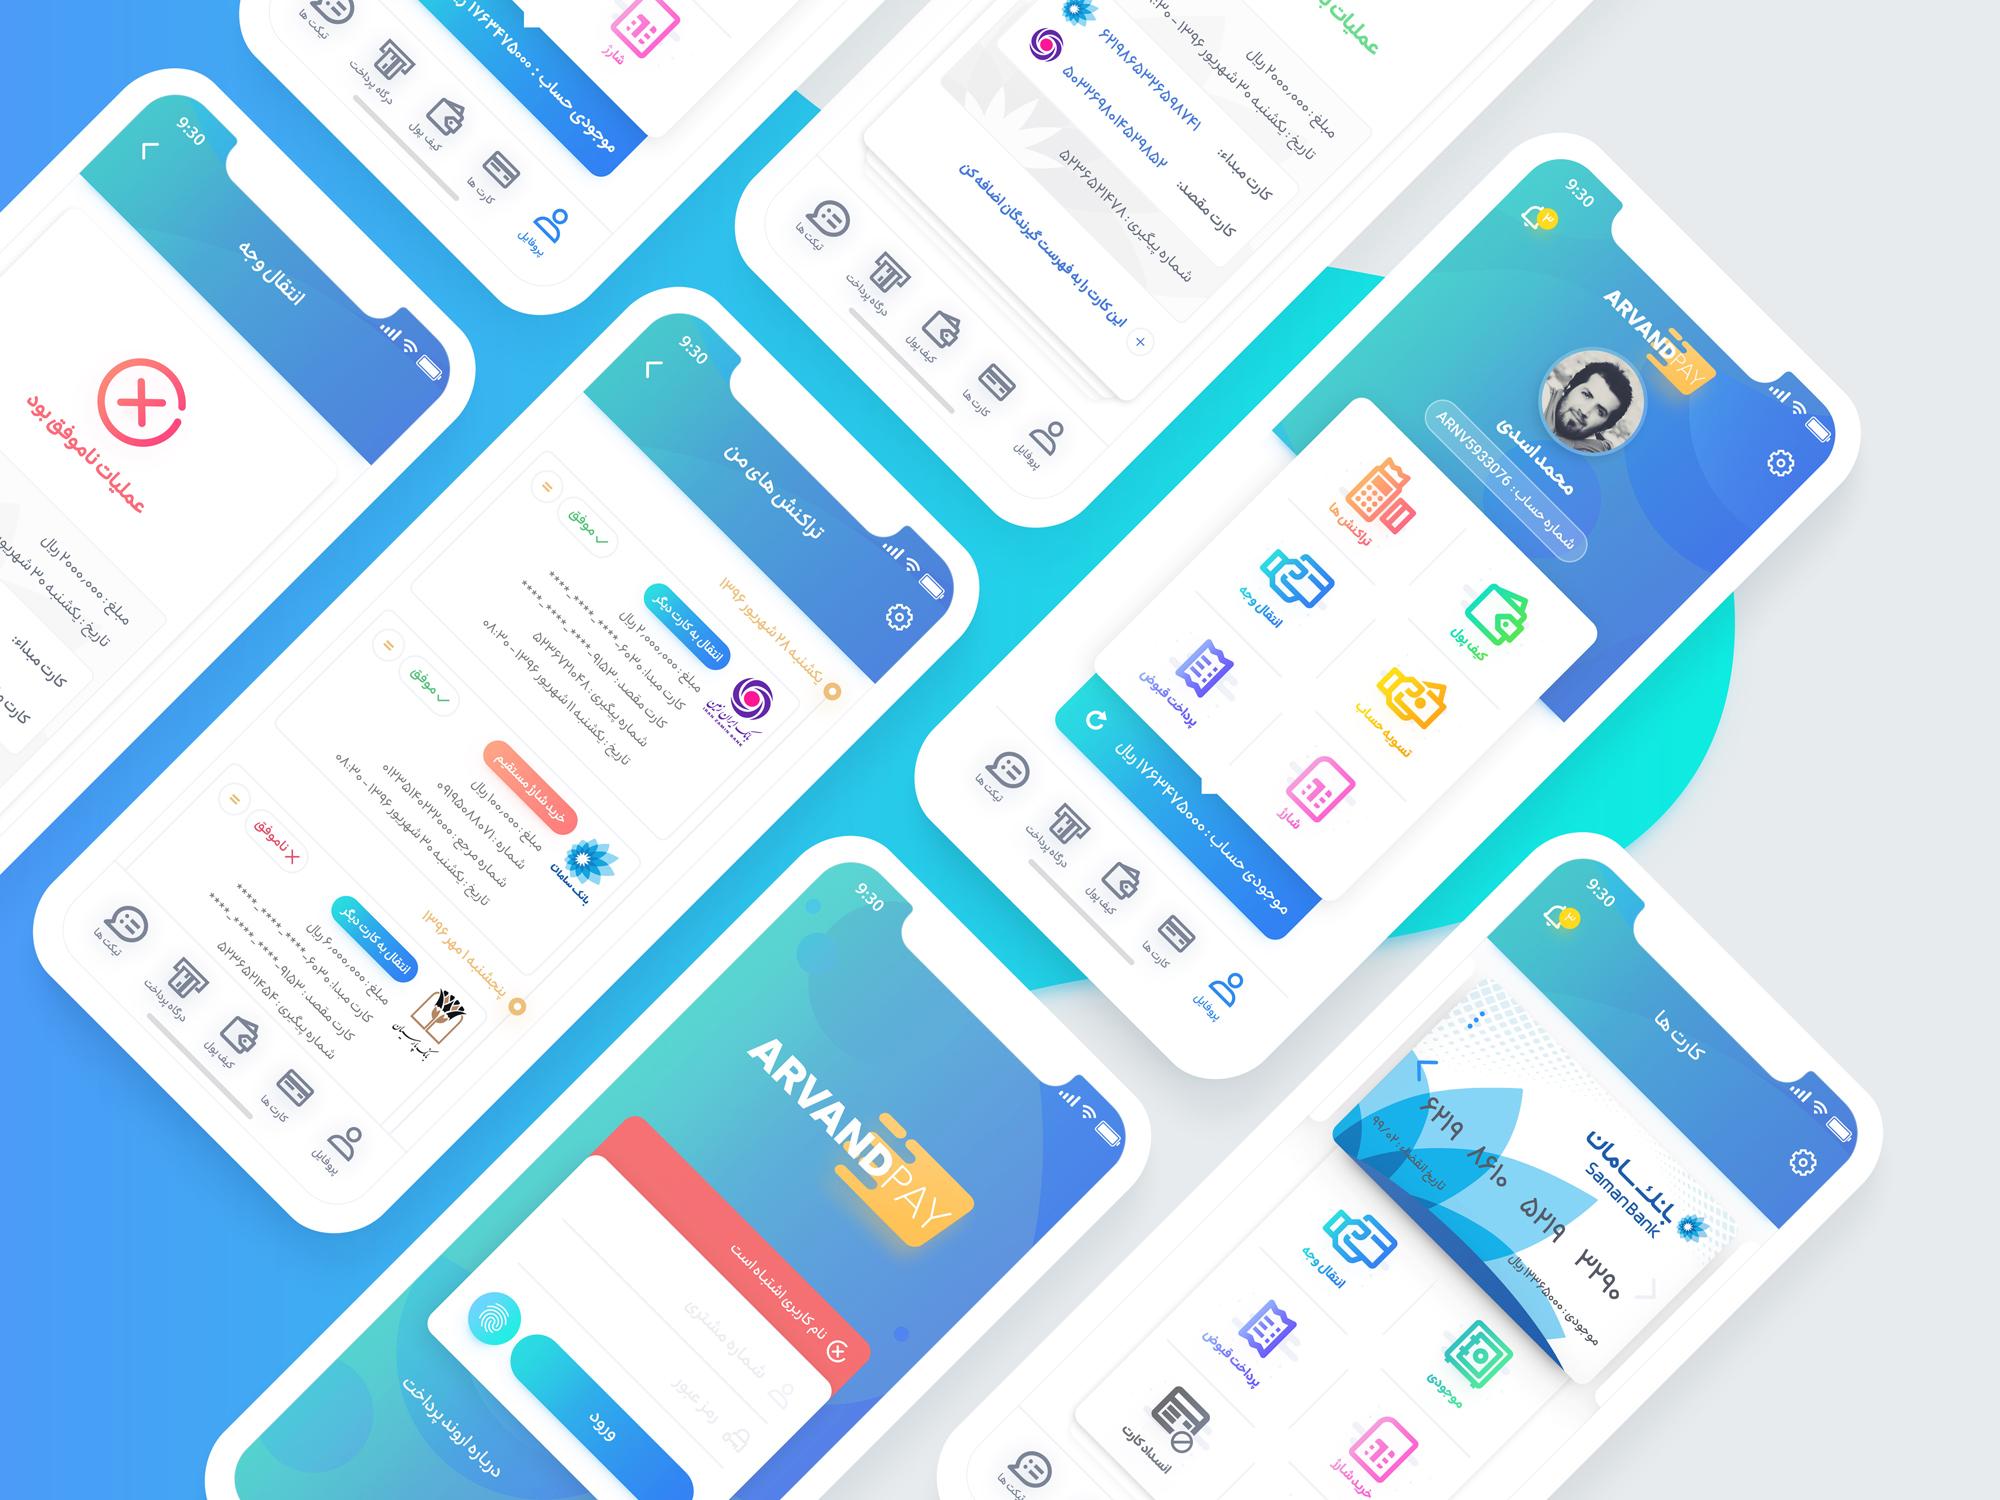 Arvandpay app